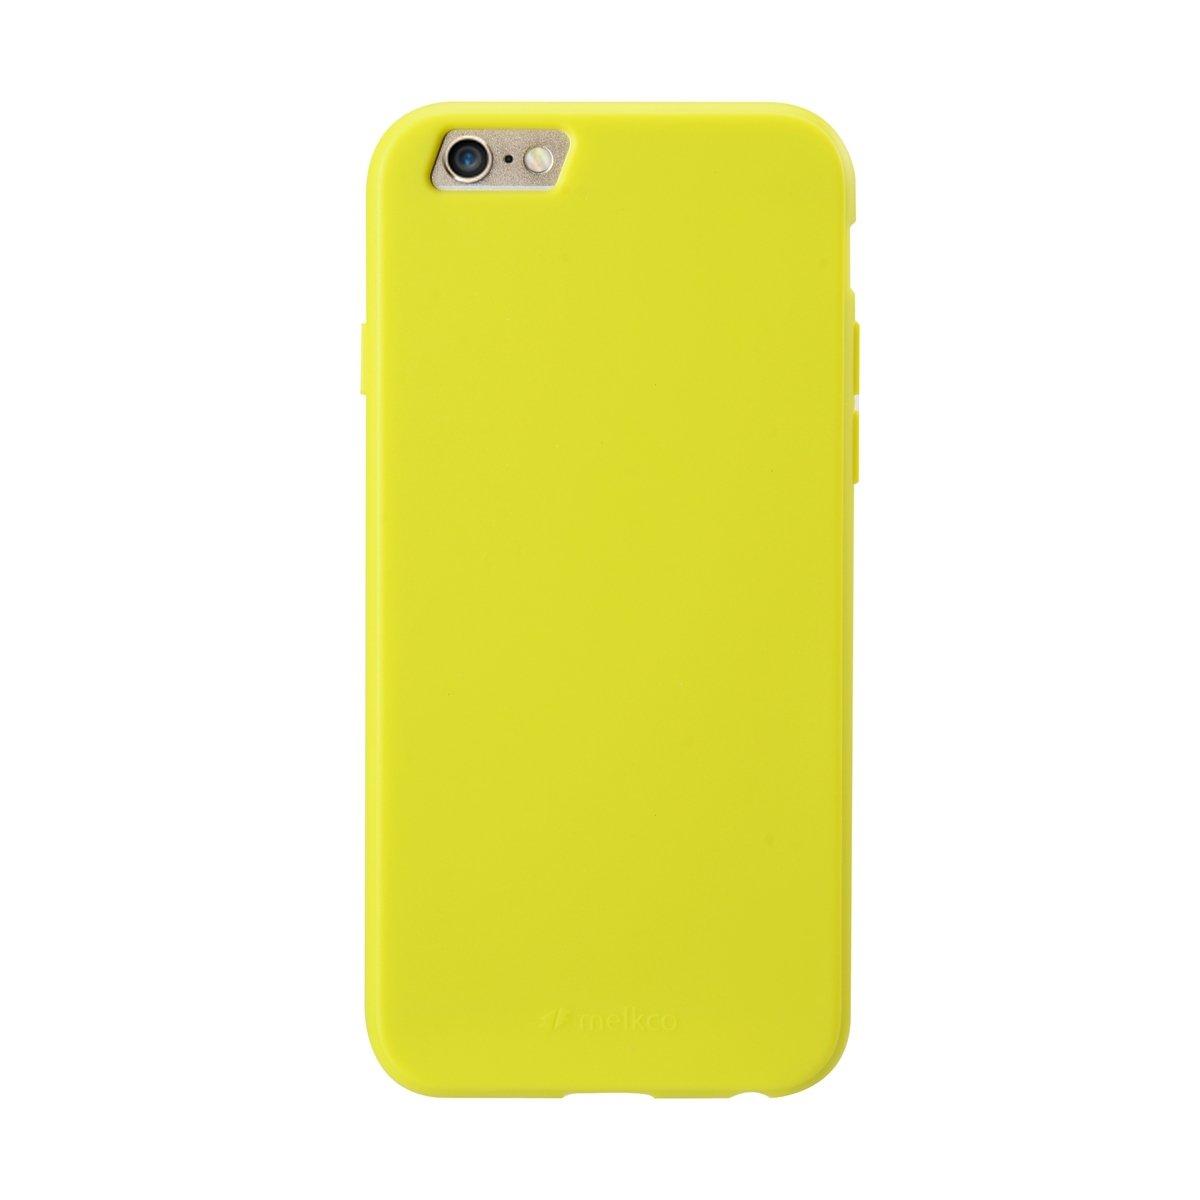 "iPhone 6 Plus/6S Plus (5.5"") Poly Jacket 手機保護殼 - 珍珠黄色(附送屏幕保護貼)"